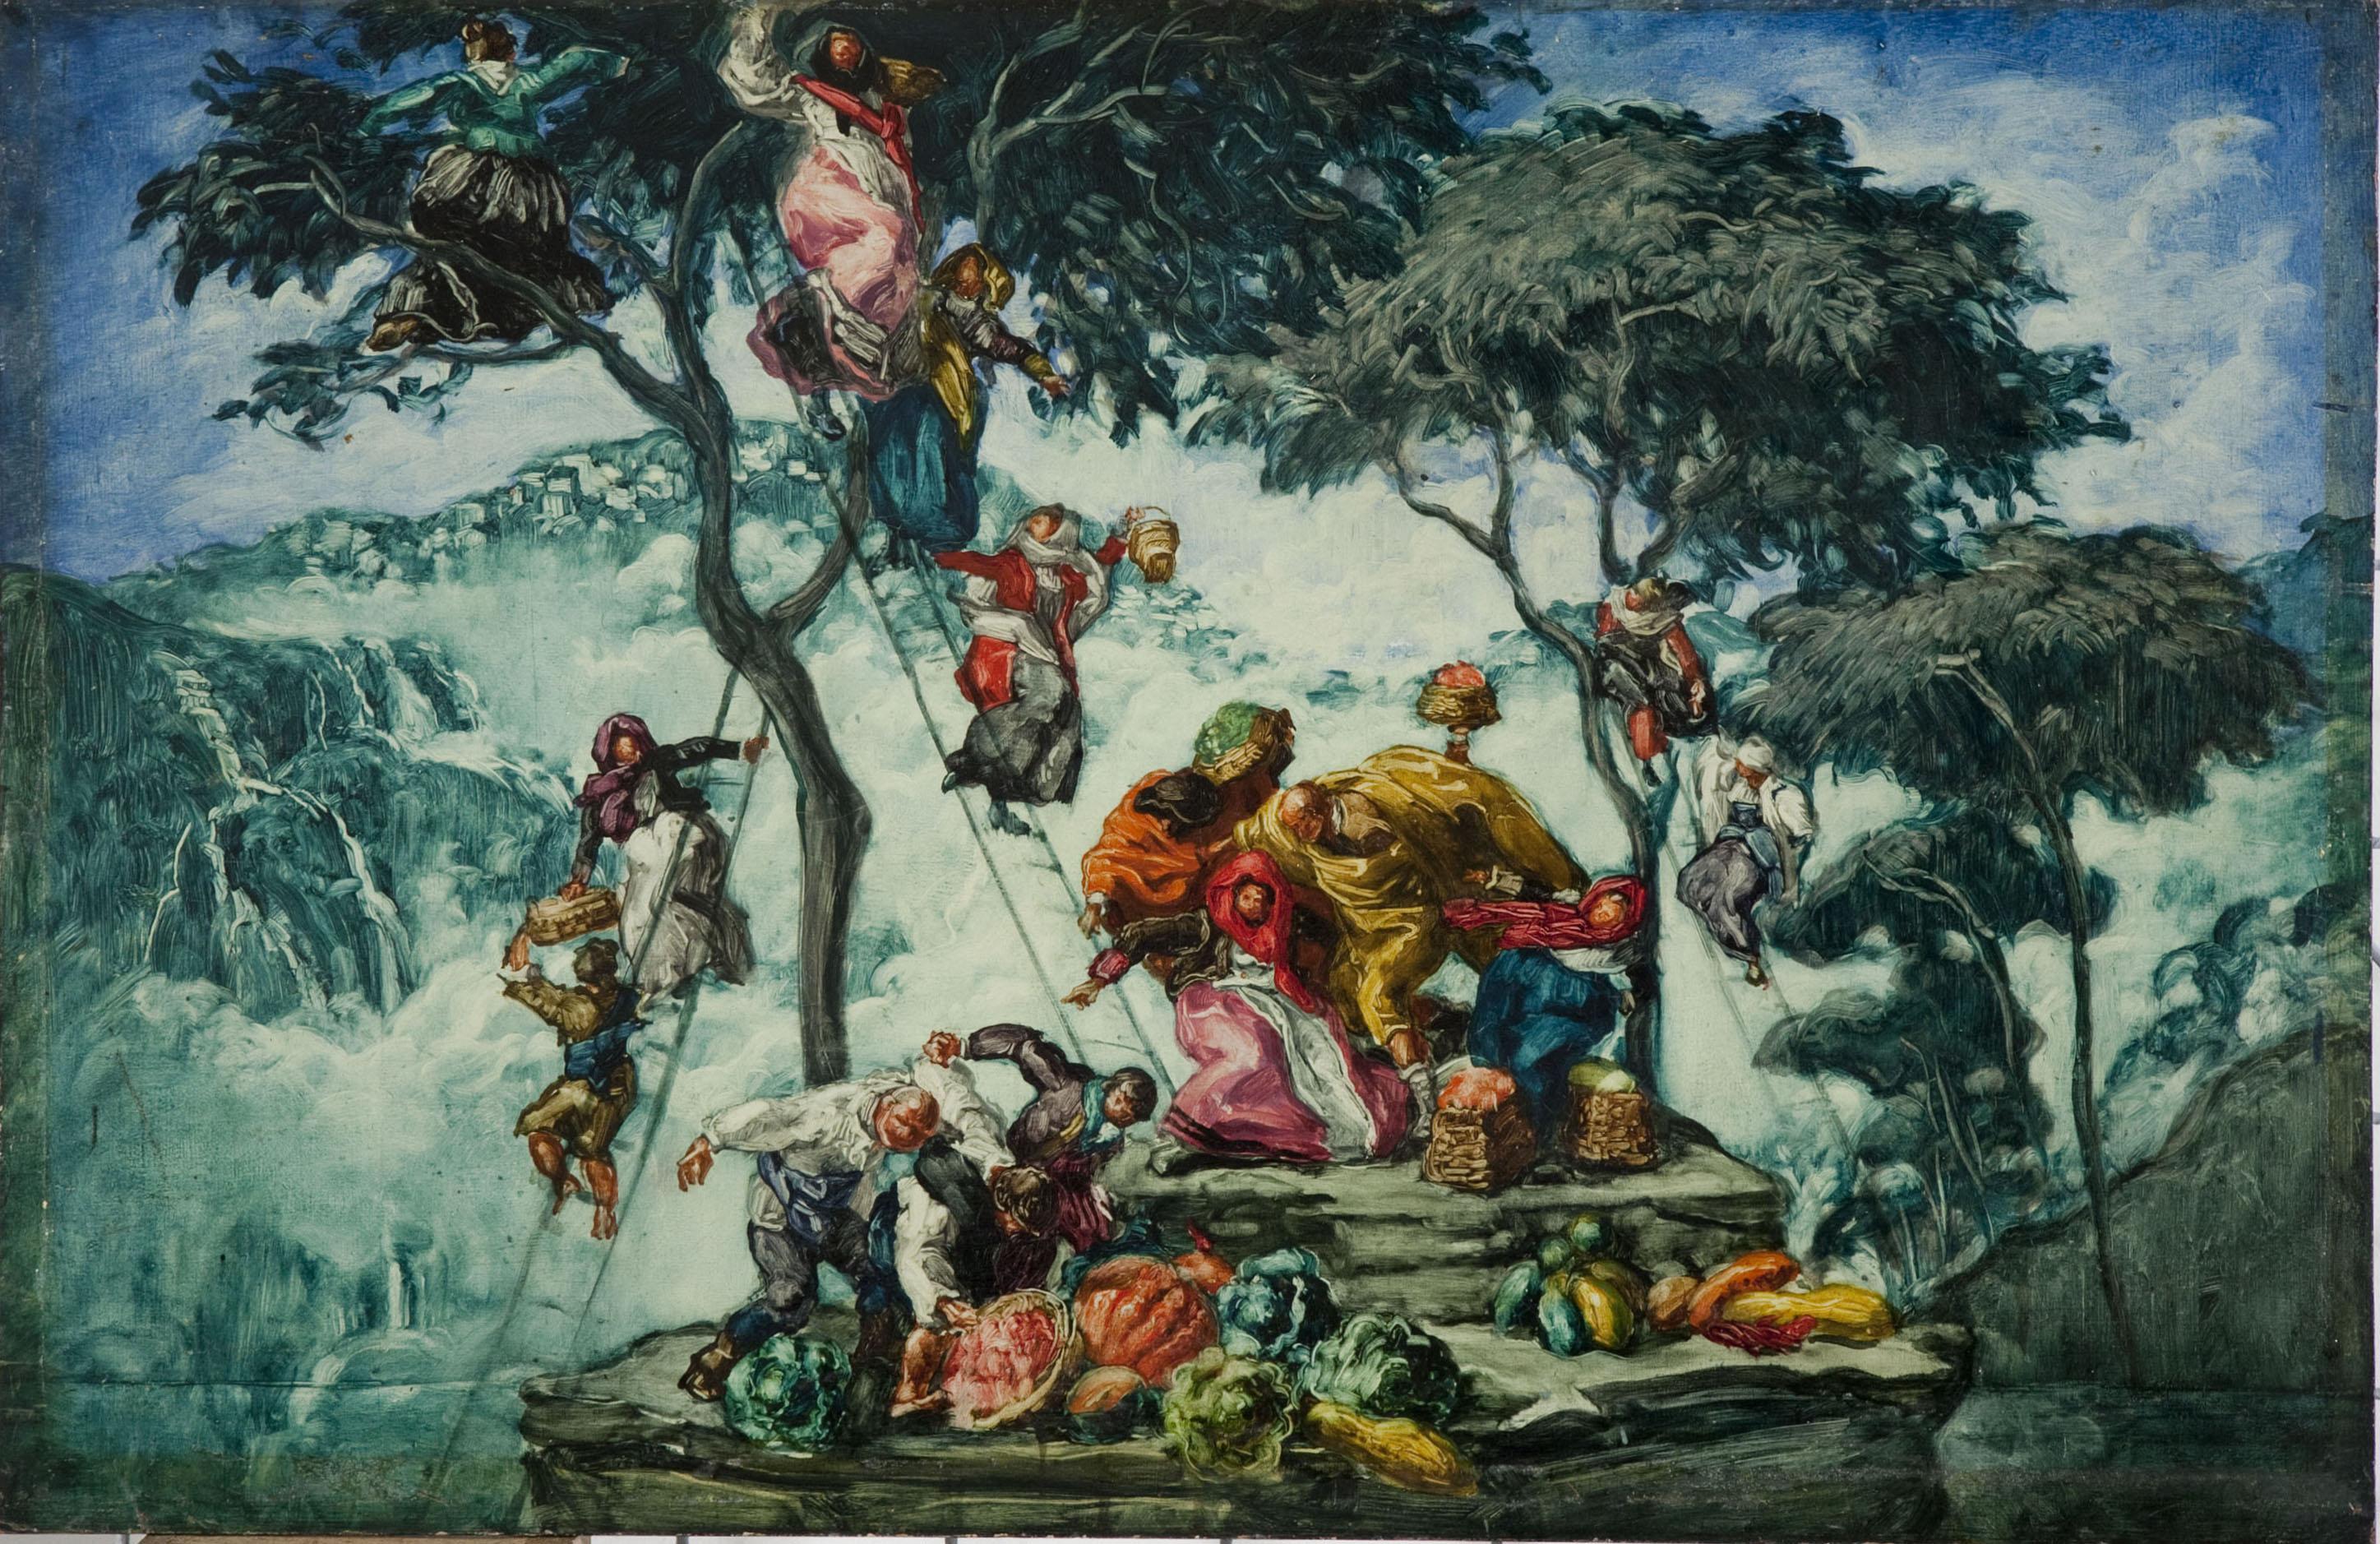 Josep Maria Sert - Europe or The Autumn (Rothschild Pavilion) - 1917-1920